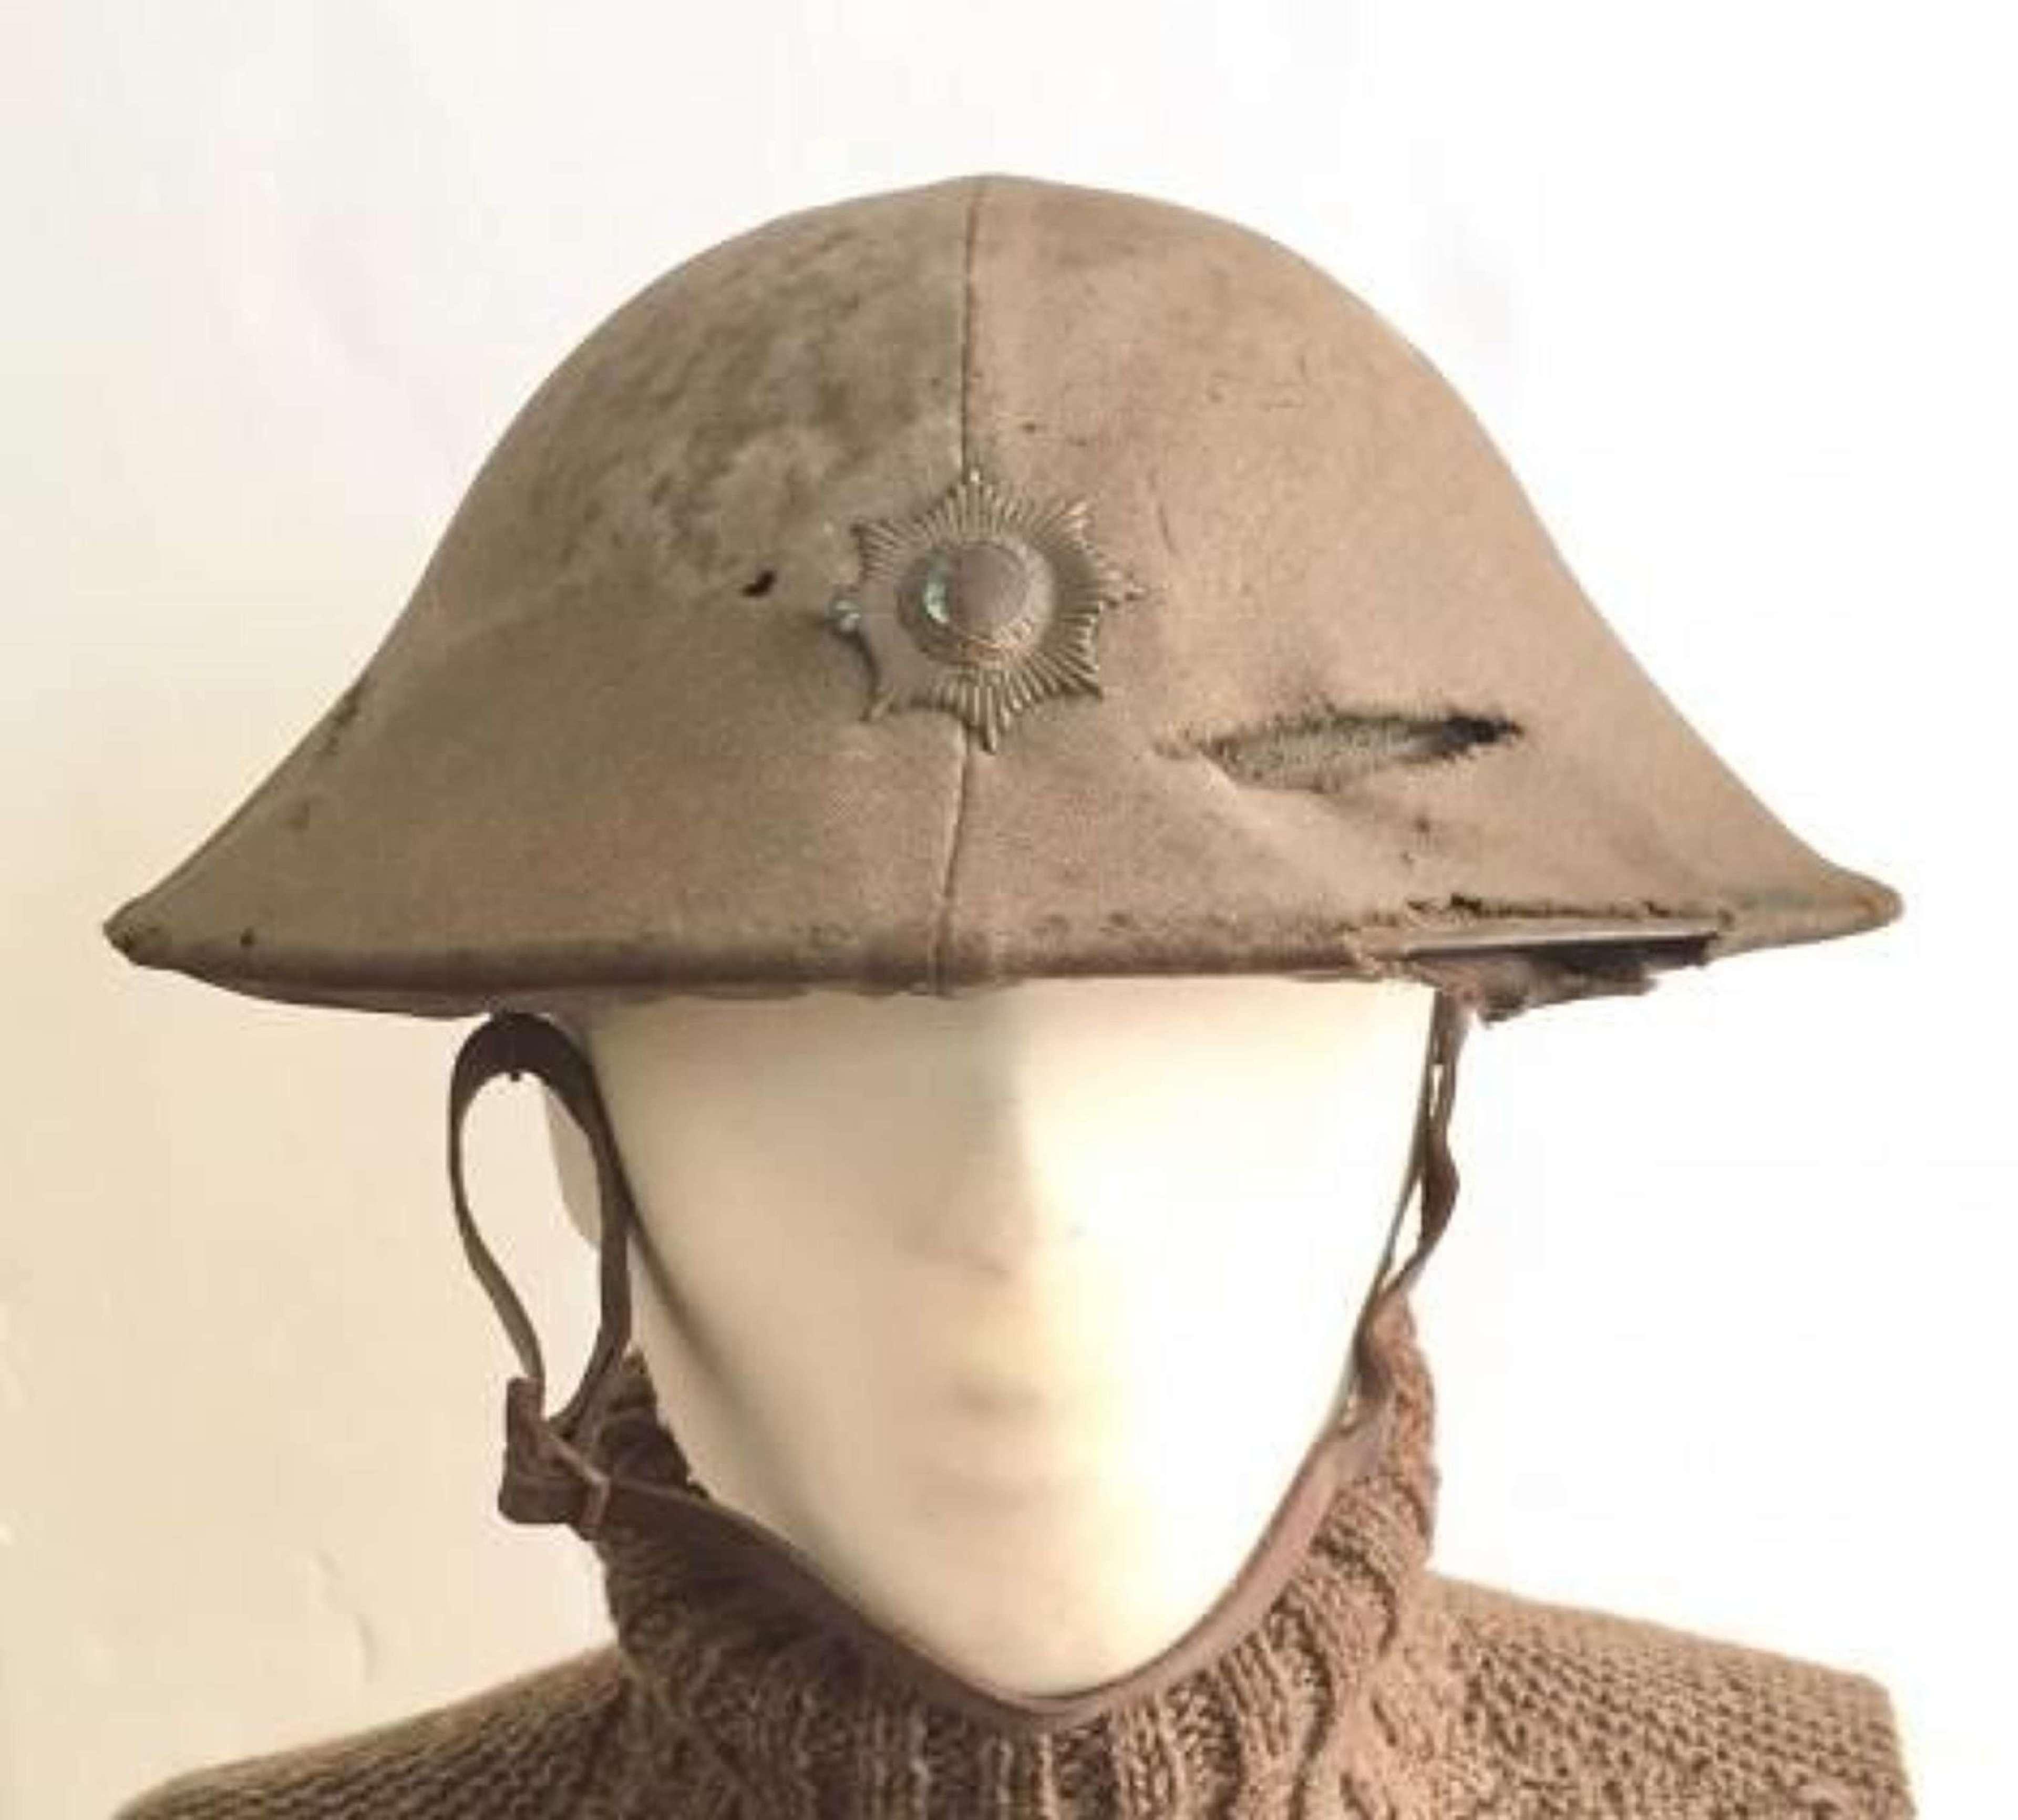 WW1 Coldstream Guards Brodie Helmet with Original Cover.